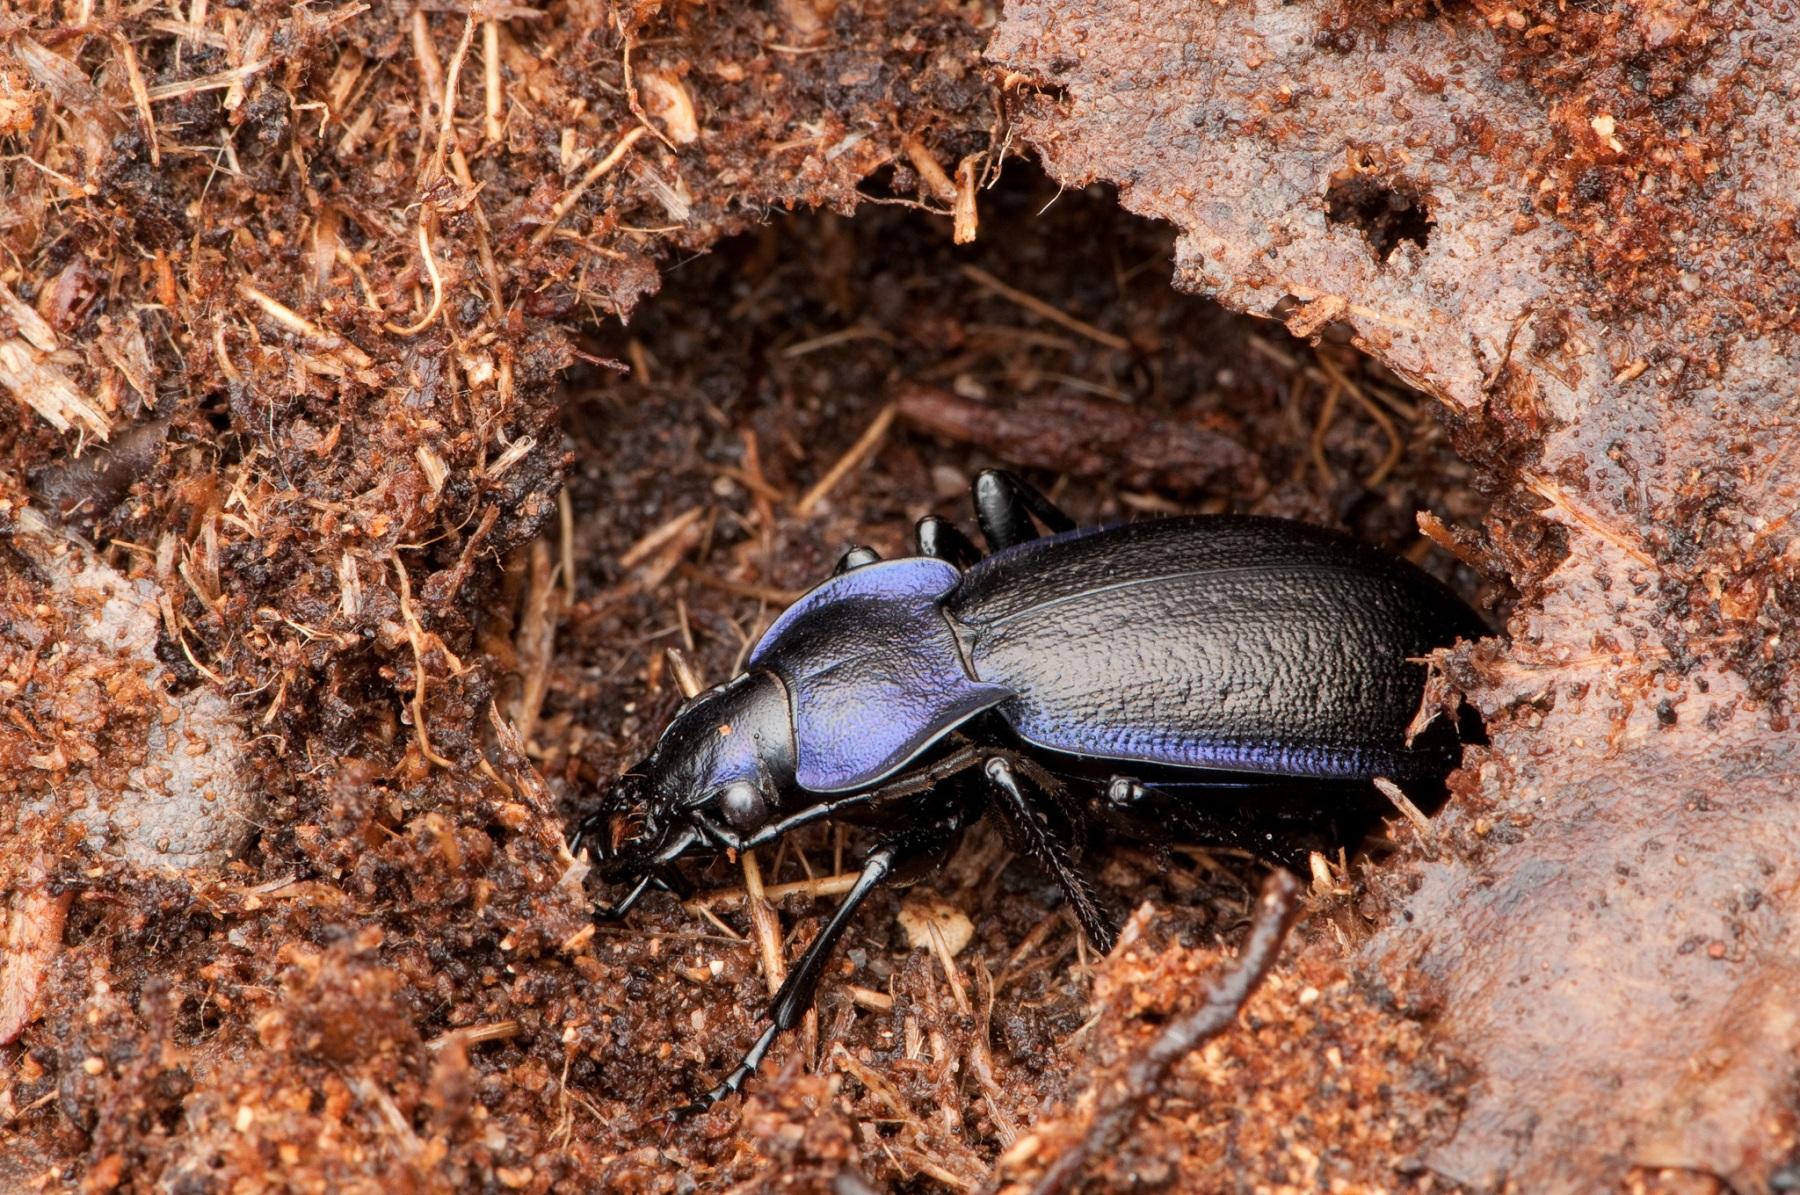 Carabus violaceus - Violet Ground Beetle, Sherwood Forest